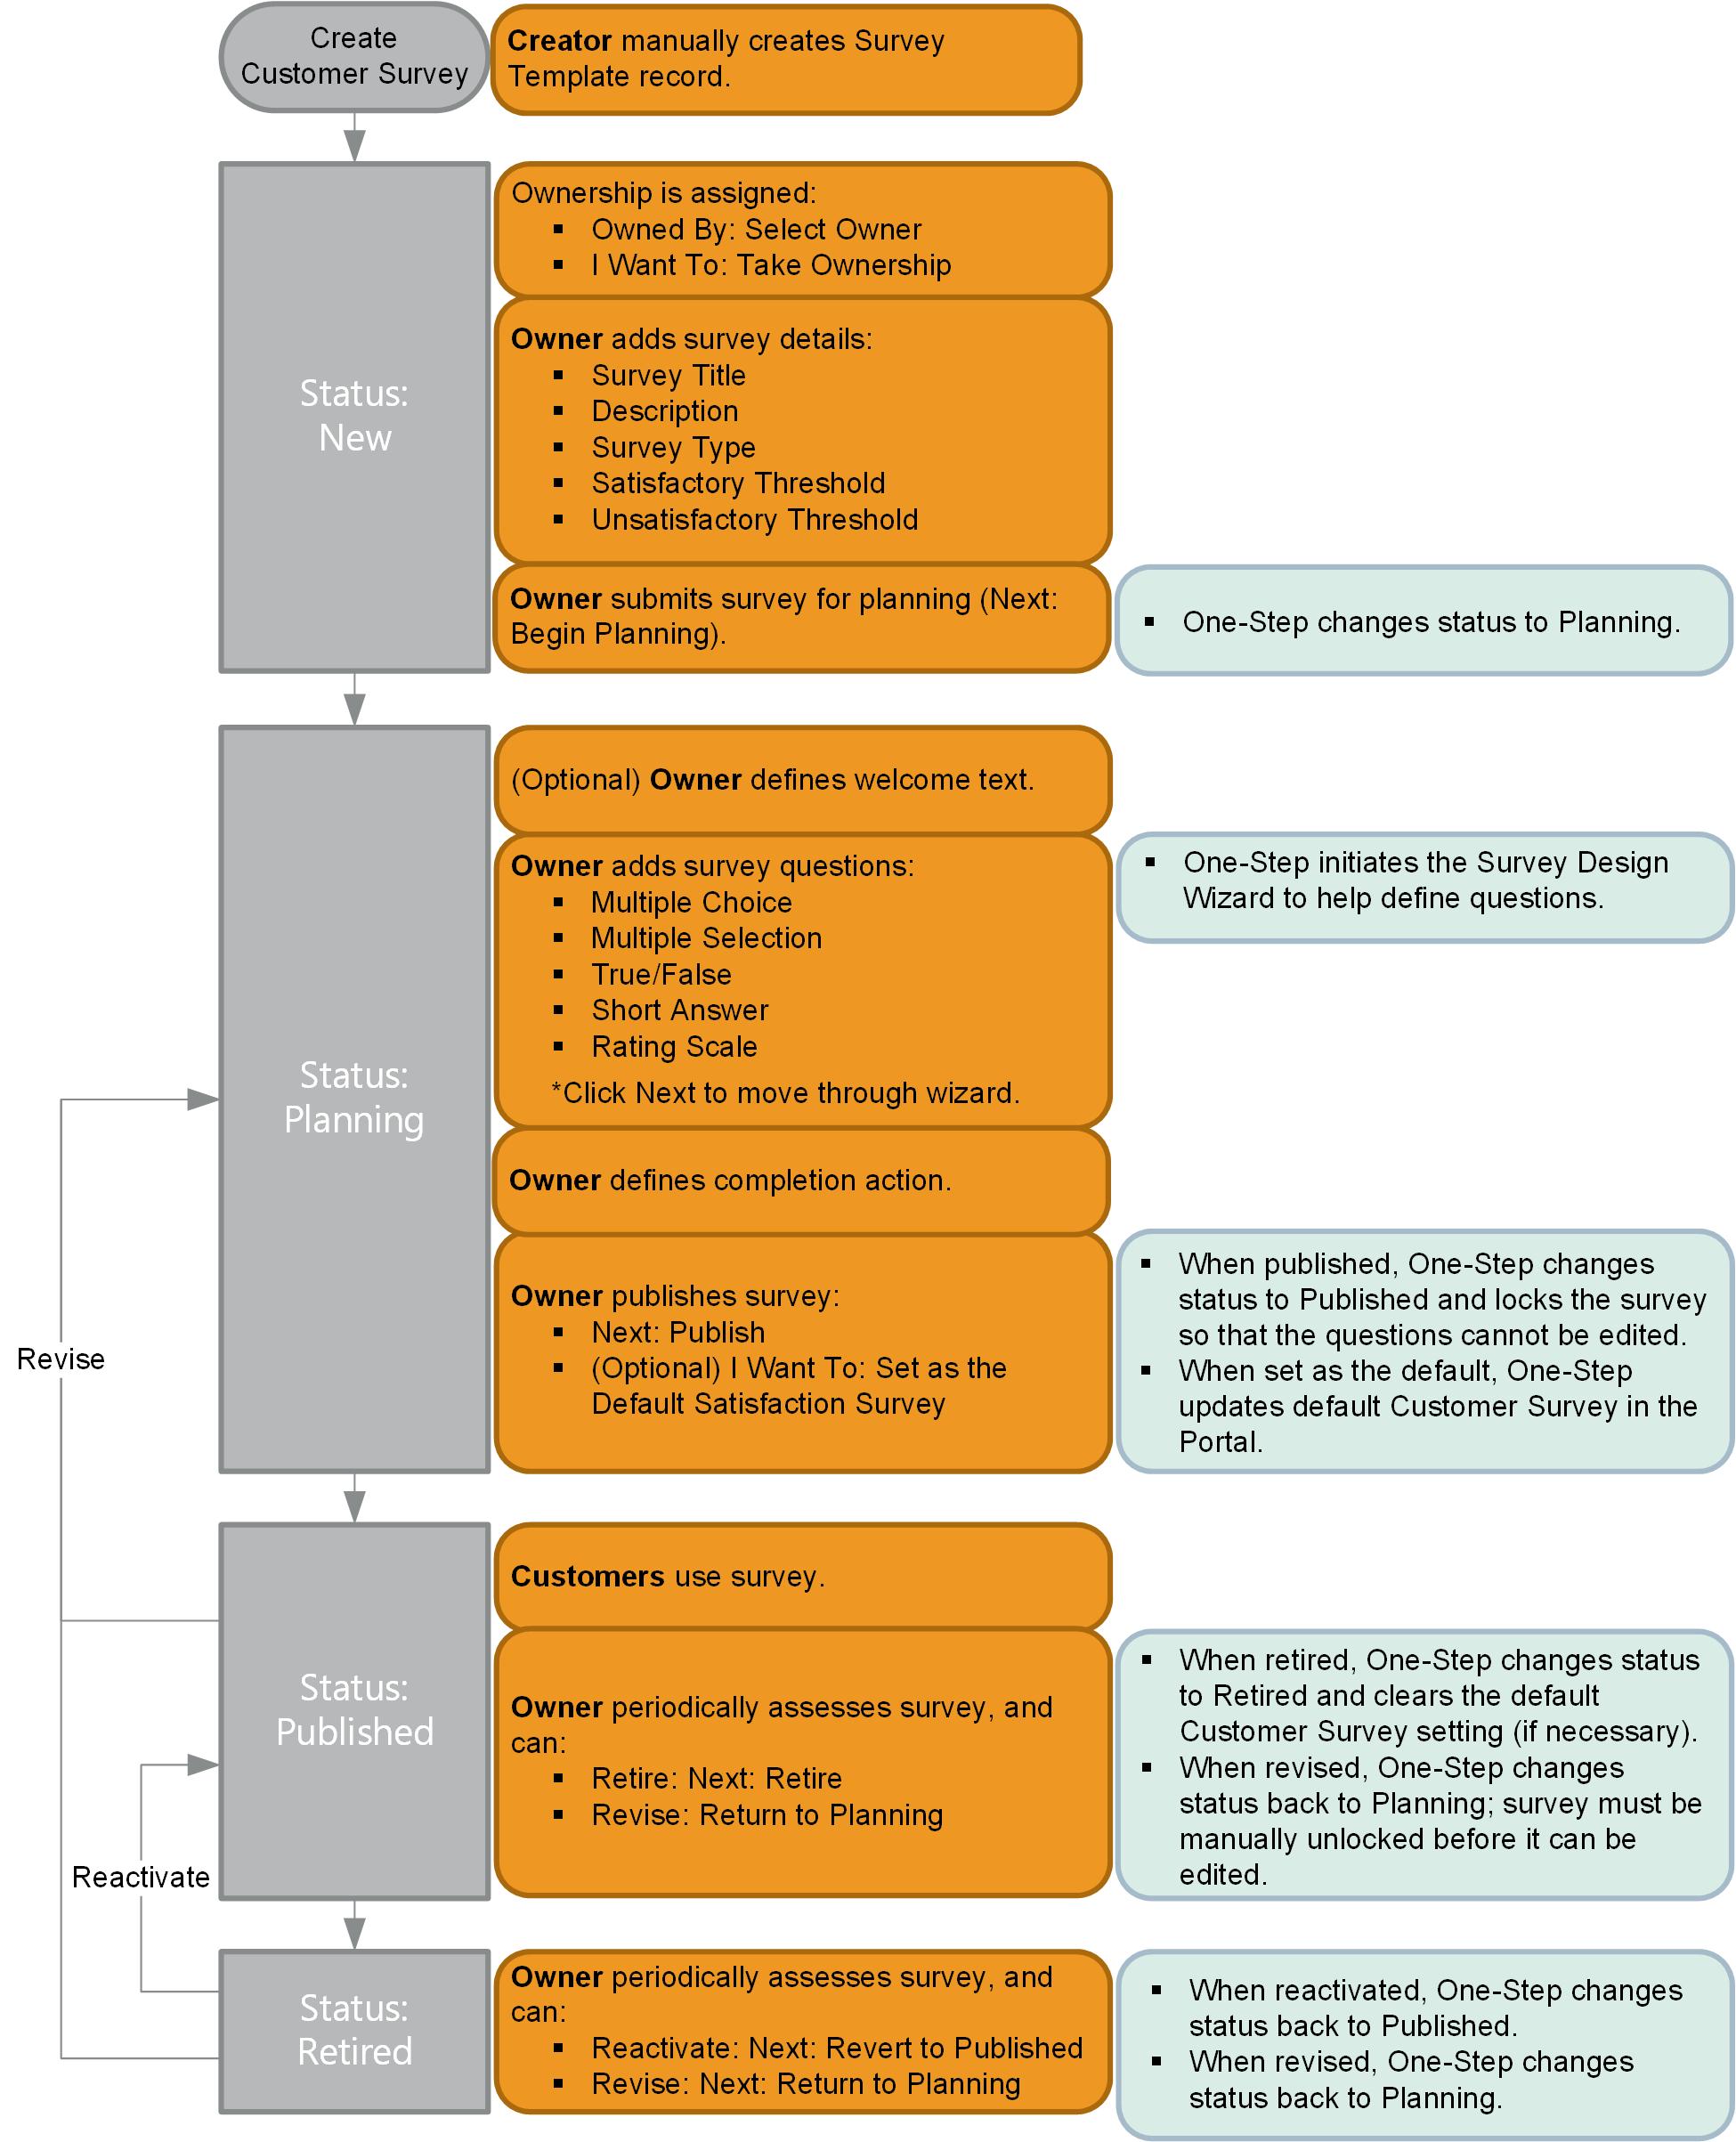 Survey Template Workflow